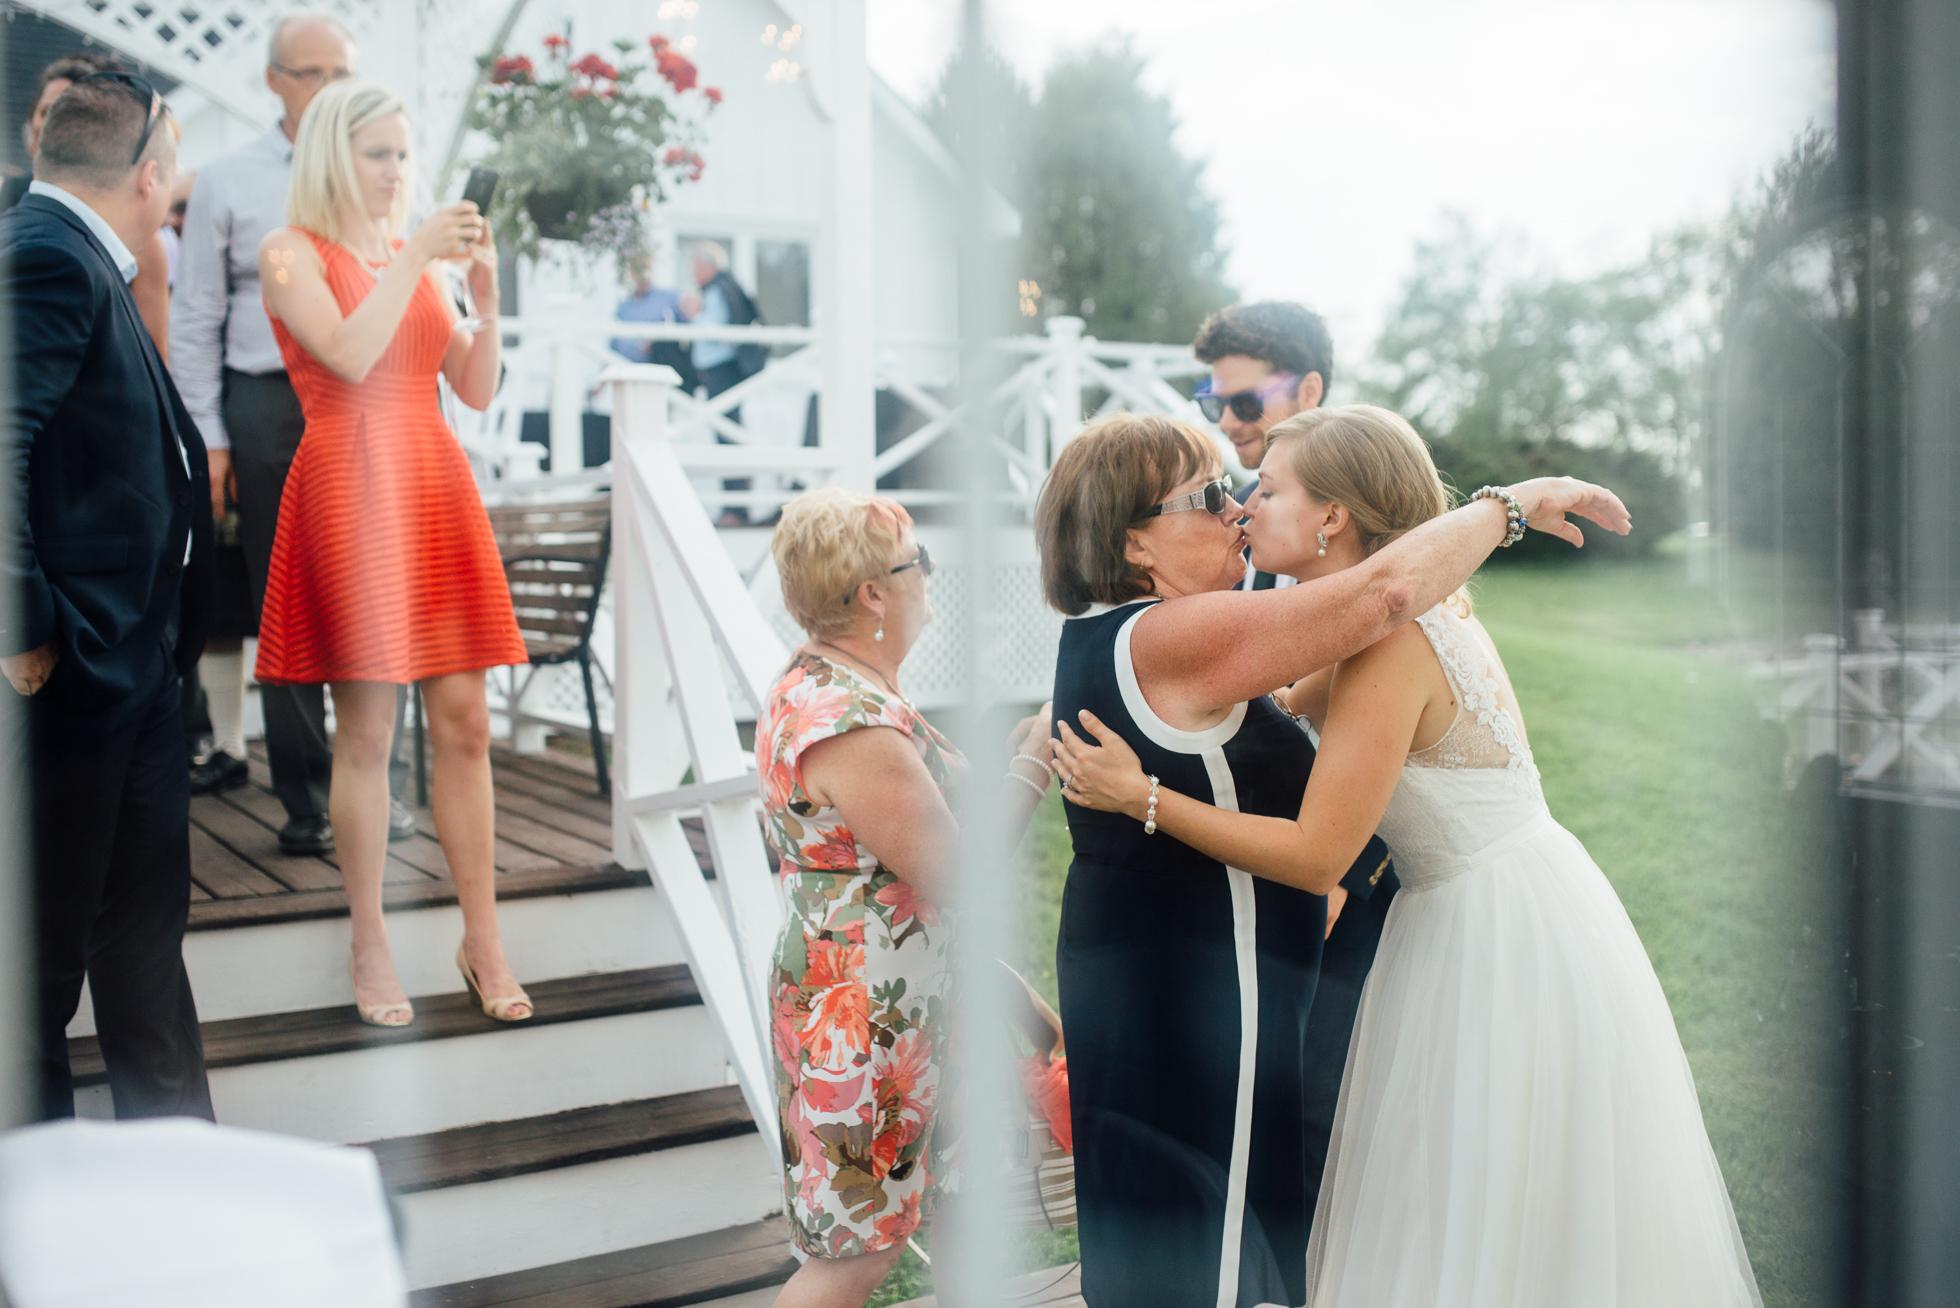 Outdoor-Caledon-Tralee-Wedding-Photography-86